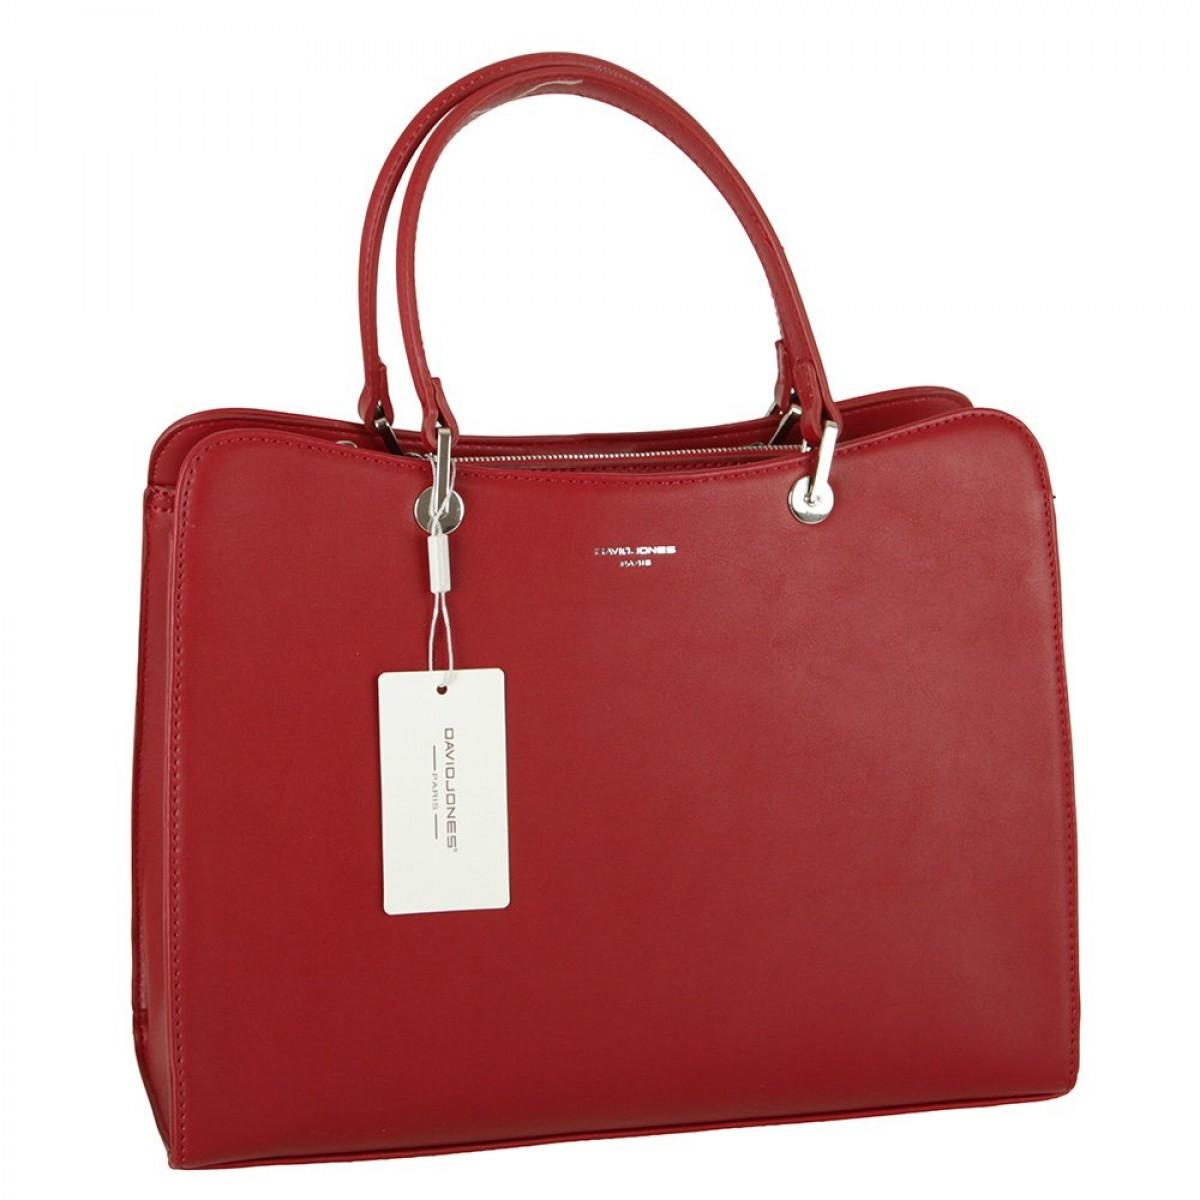 Жіноча сумка David Jones CM5815 DARK RED